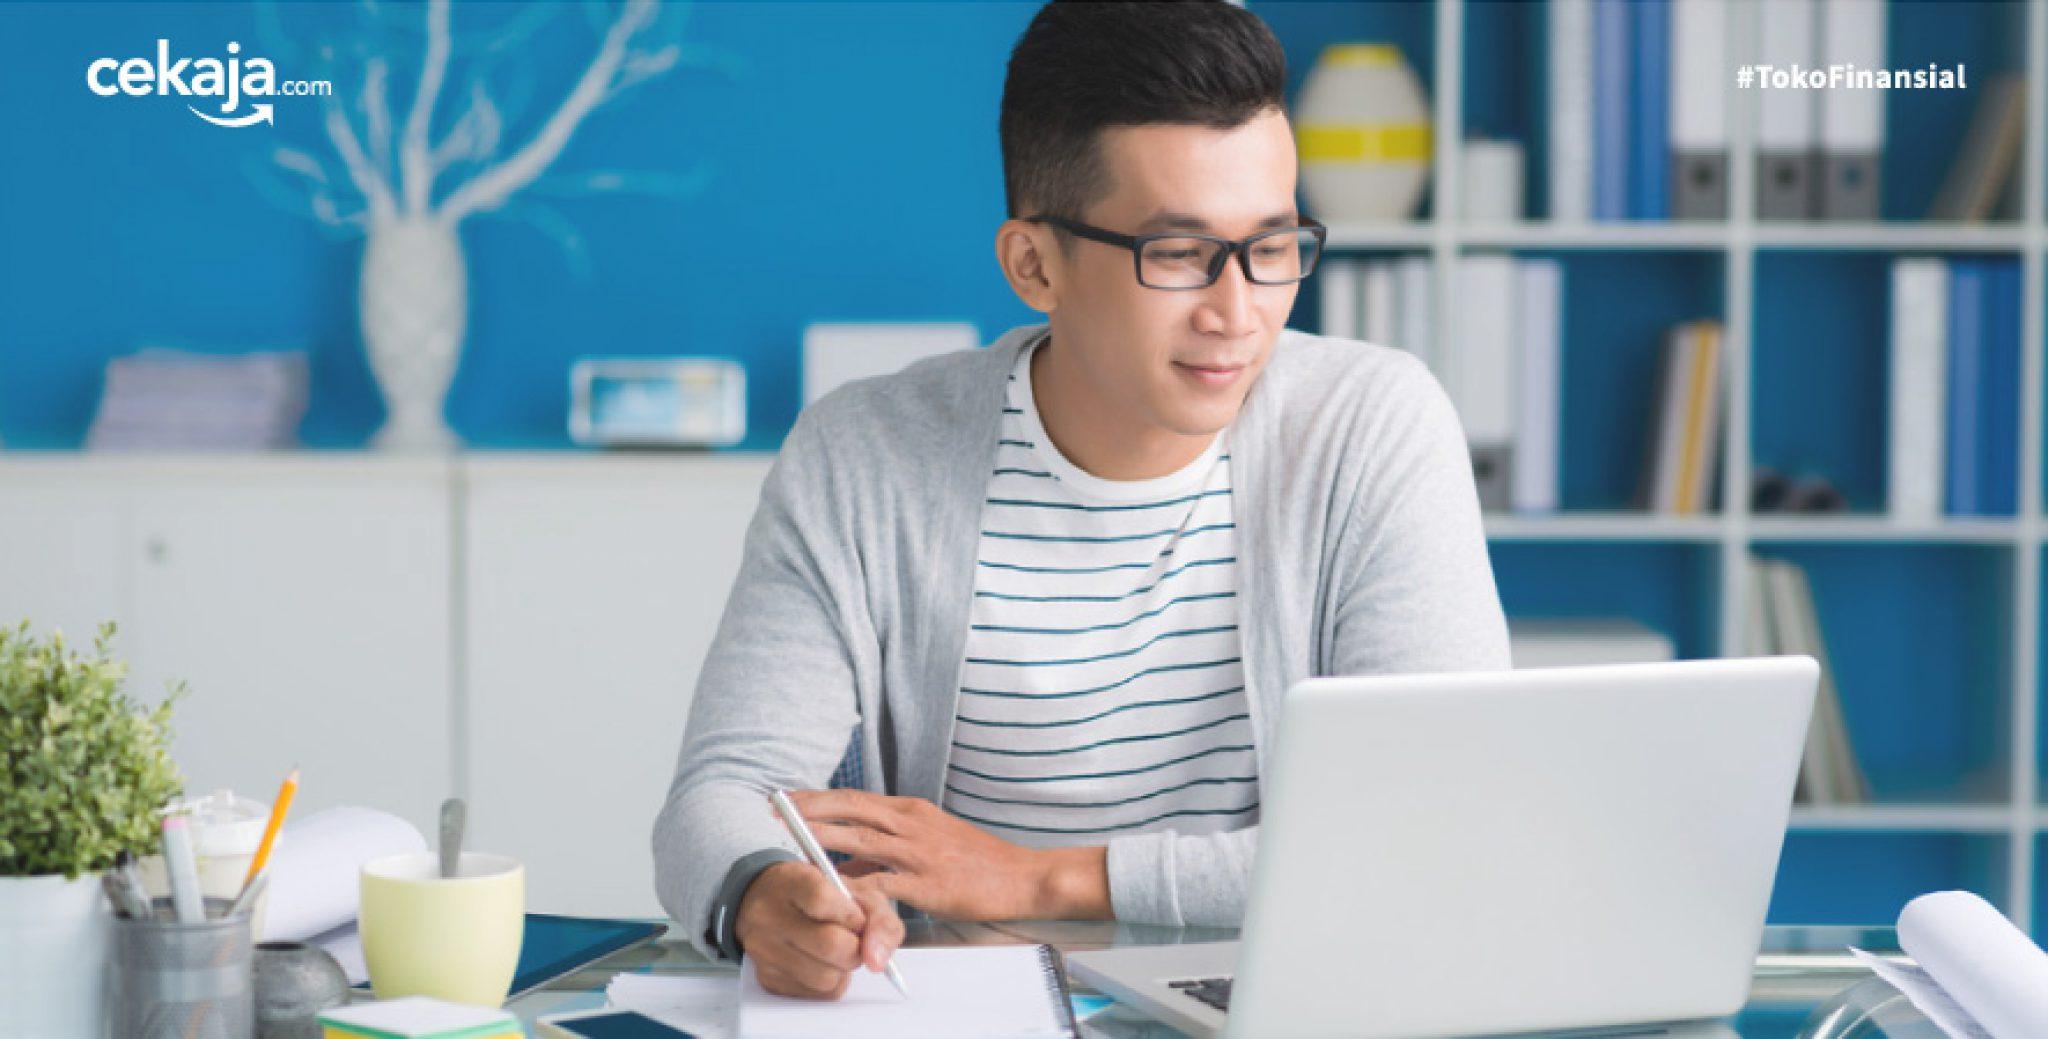 tips karier_kartu kredit - CekAja.com